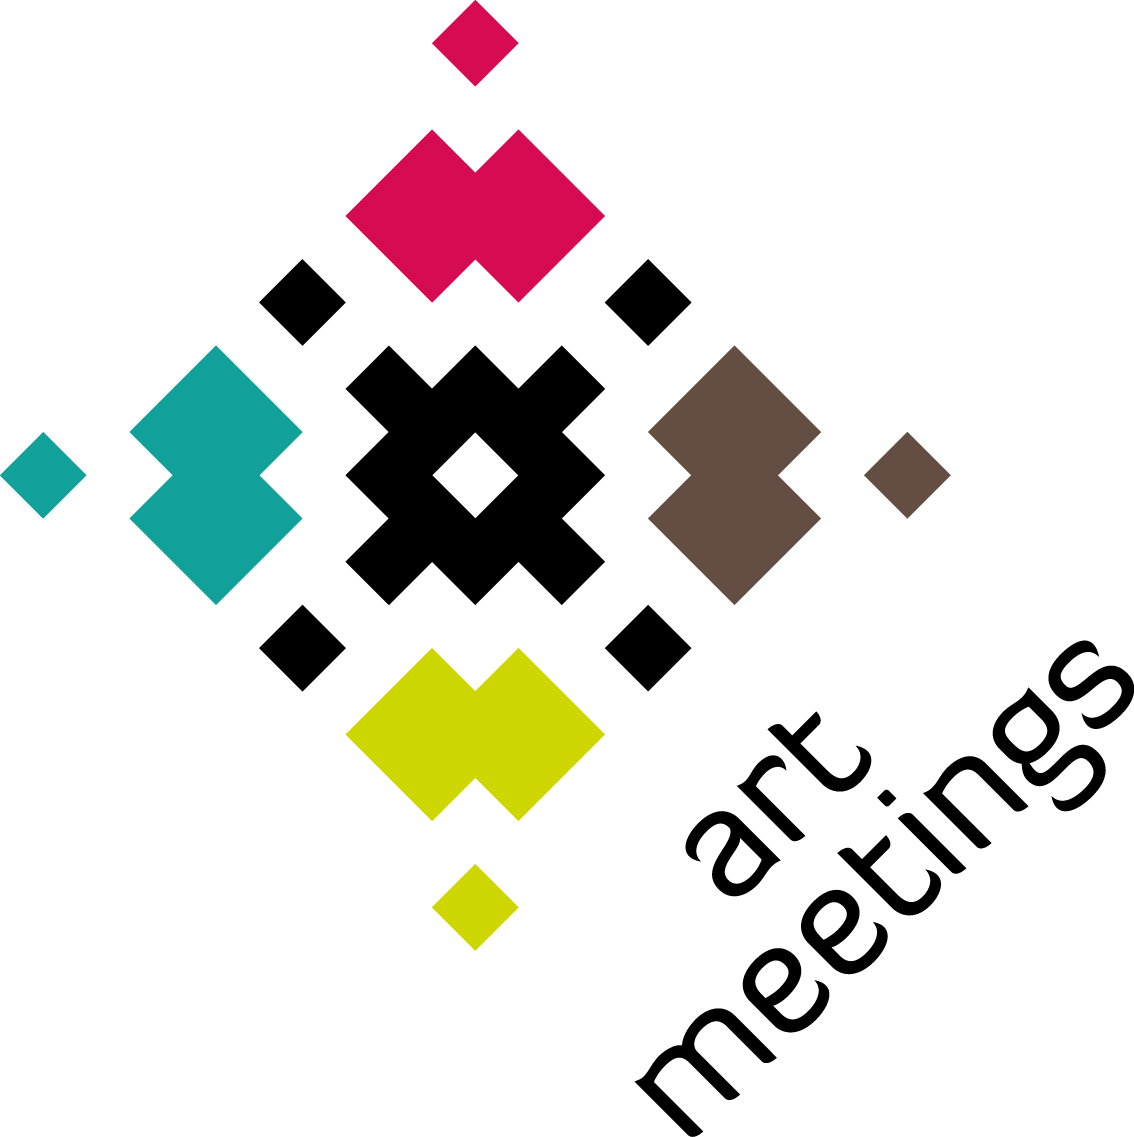 Logo Art Meetings (źródło: materiały prasowe organizatora)